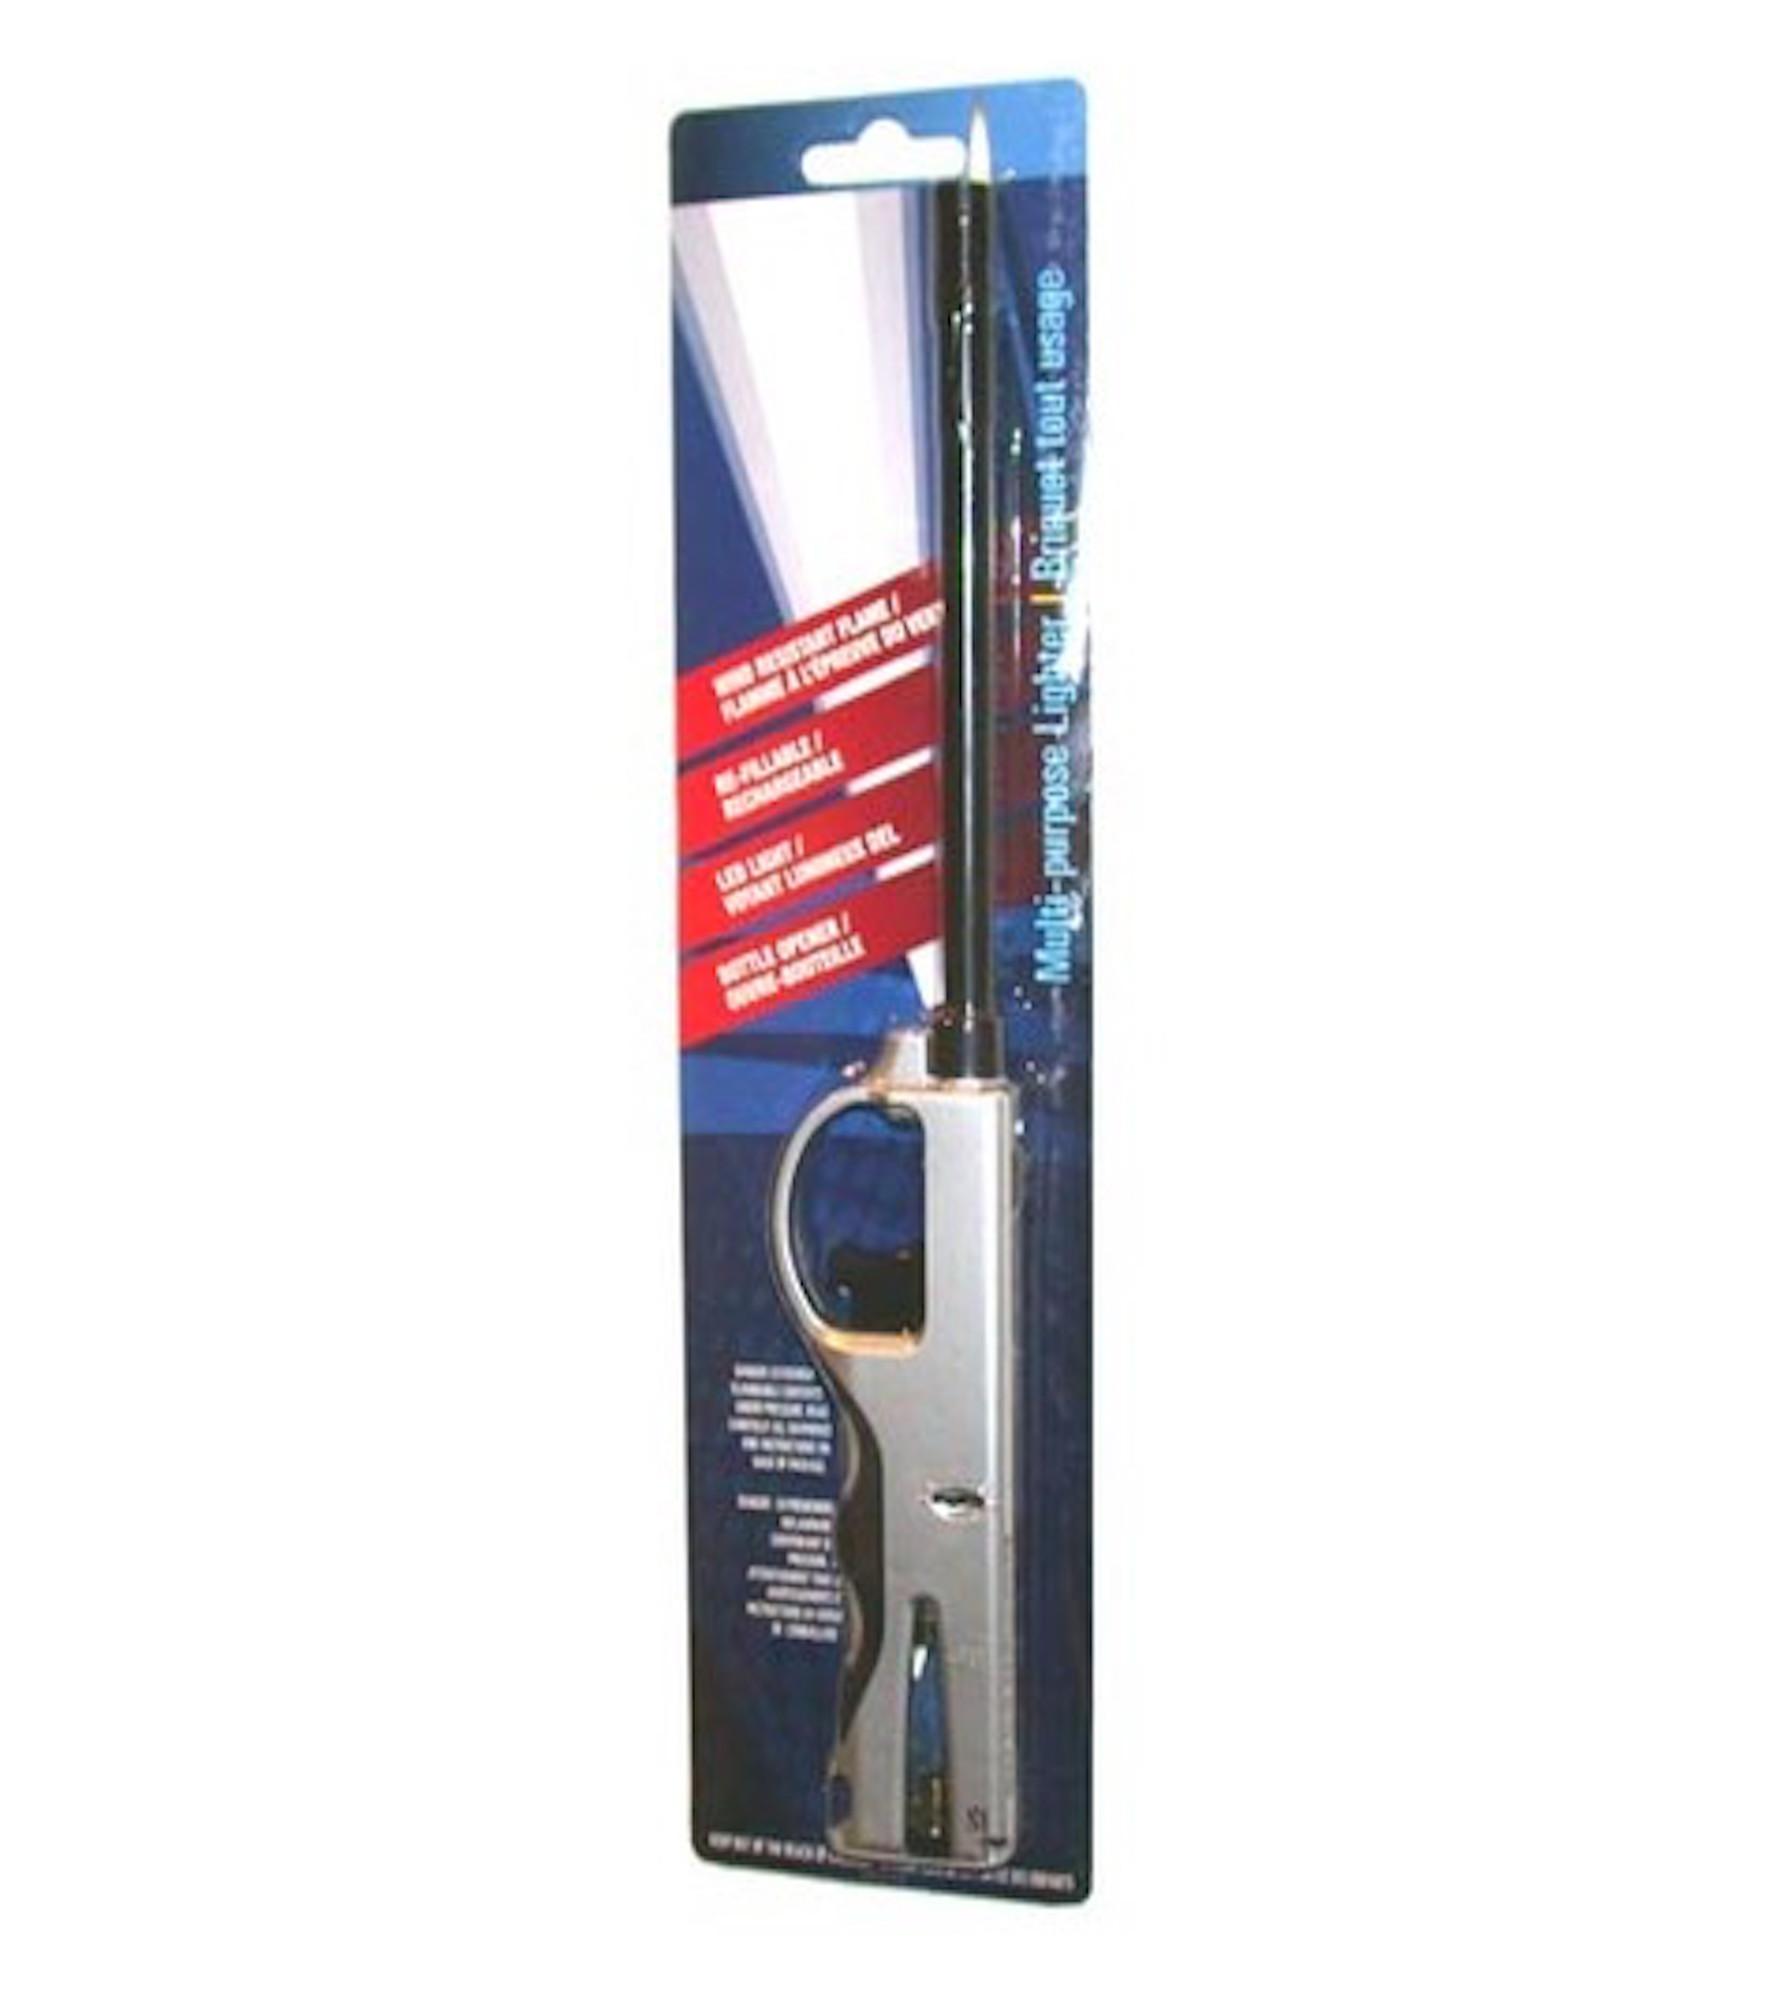 Windproof Utility Lighter